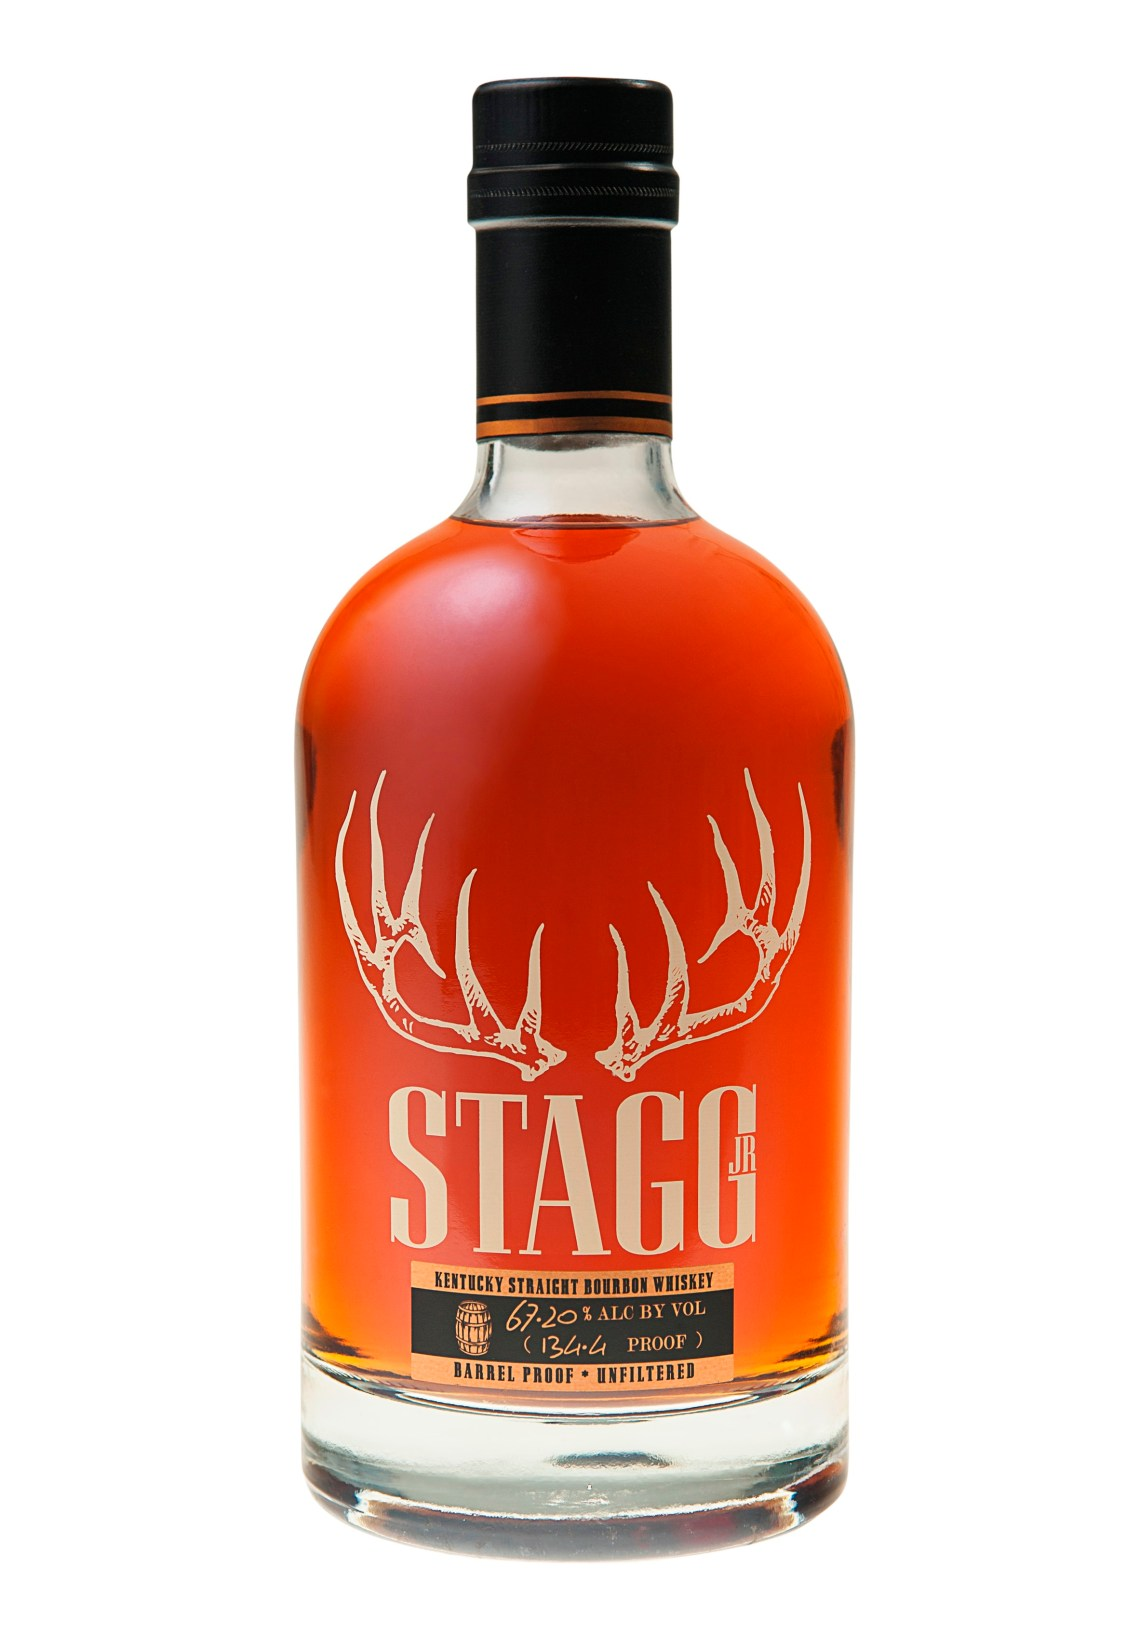 Stagg Jr. Bourbon Batch #1 (2013)